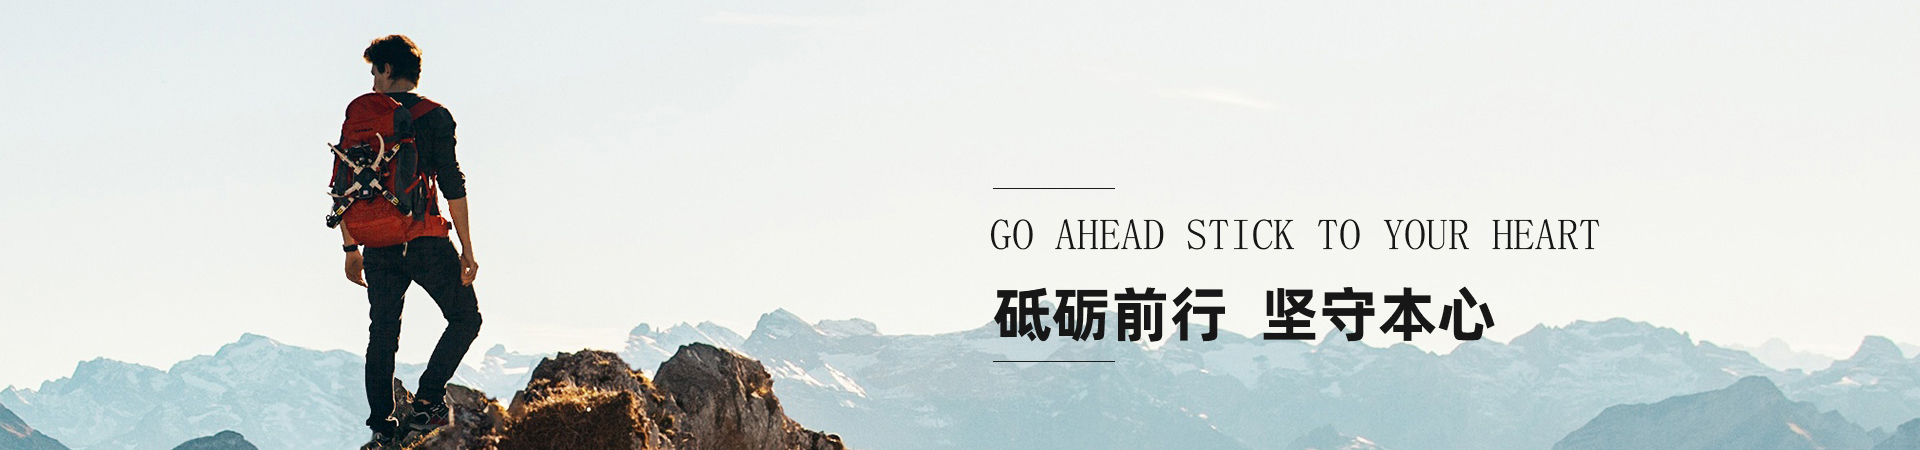 http://www.ychongkun.com/data/upload/201911/20191116165113_234.jpg